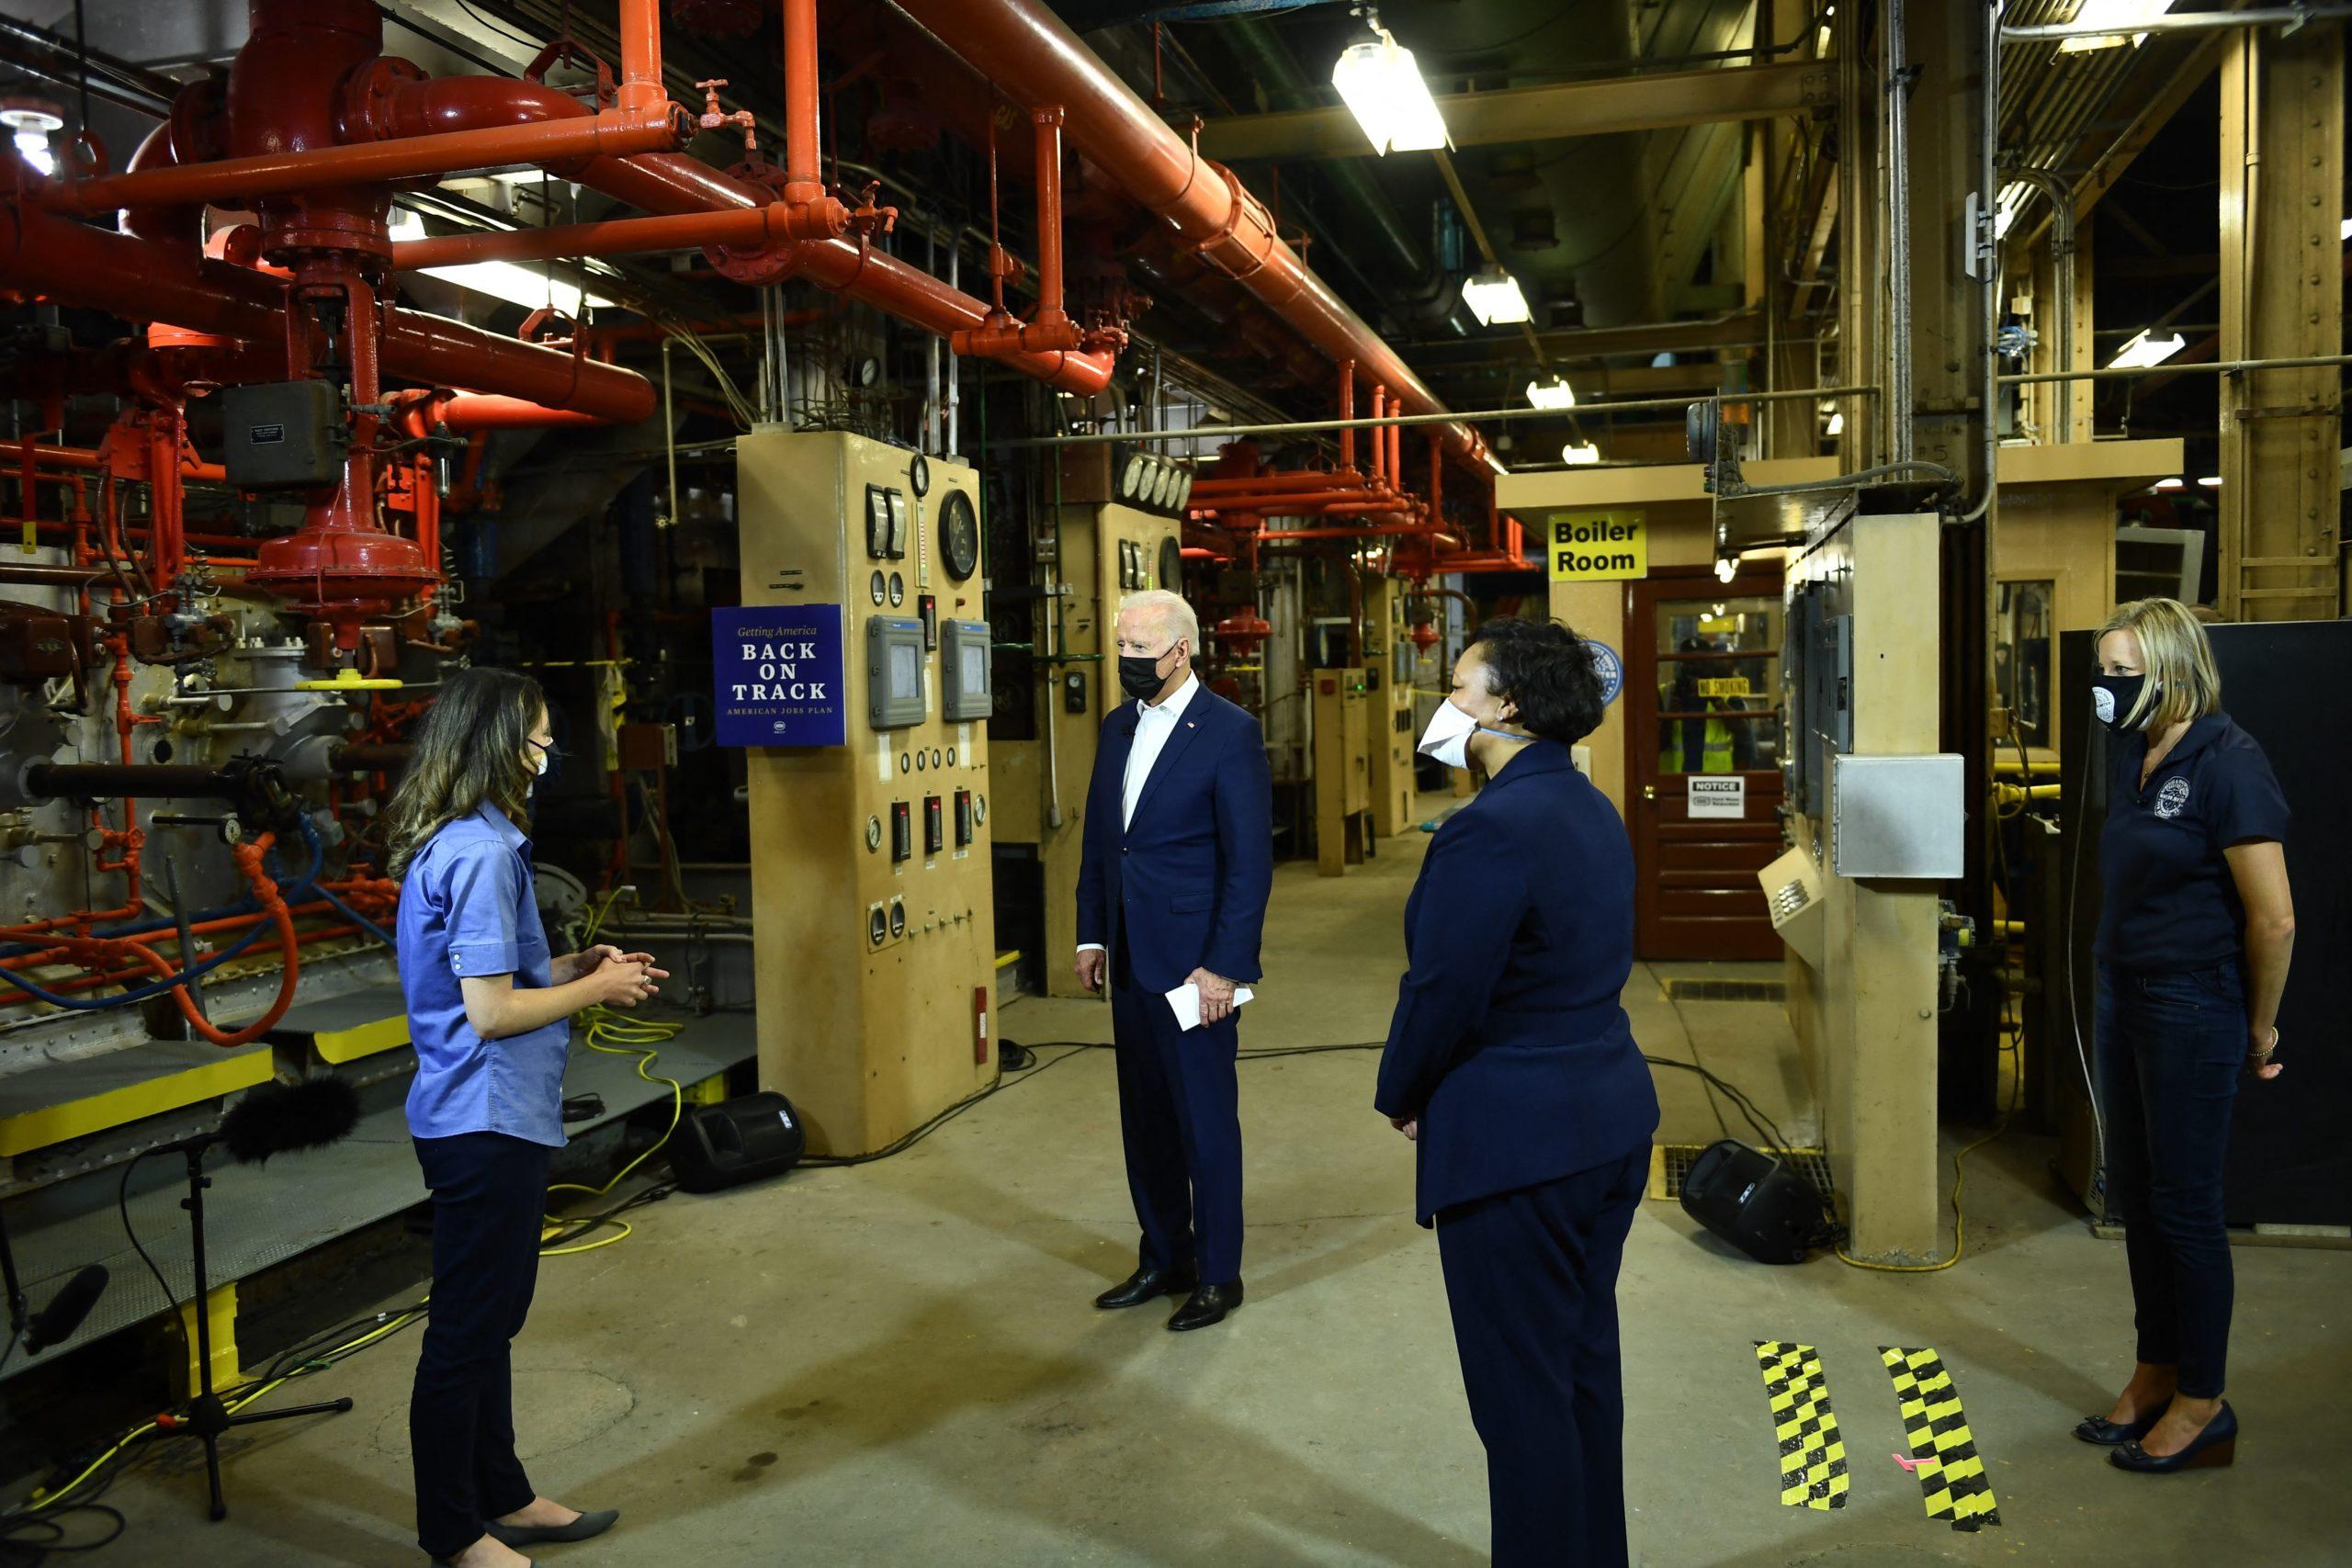 President Joe Biden and New Orleans Mayor LaToya Cantrell listen as they tour the Carrollton water treatment plant in New Orleans, Louisiana on Thursday. (Brendan Smialowski/AFP via Getty Images)